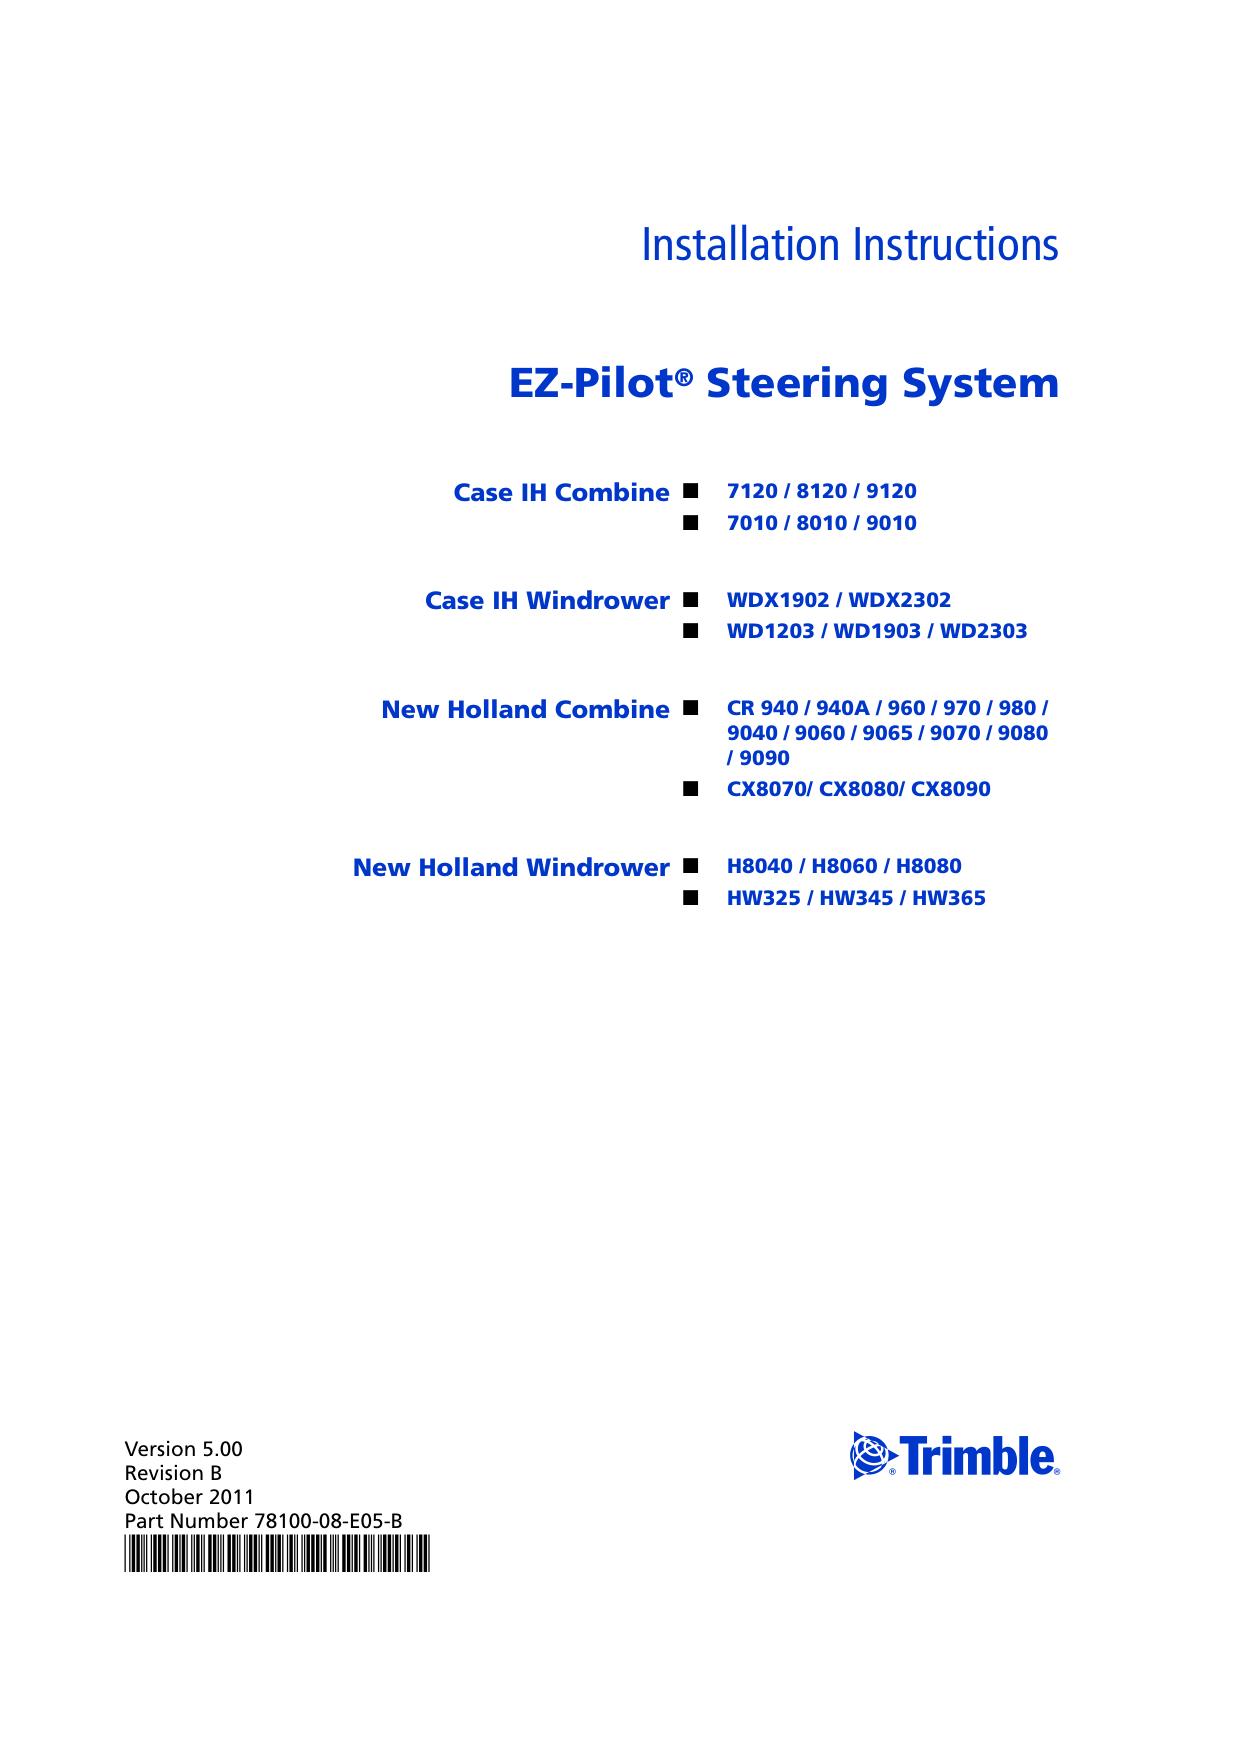 EZ-Pilot Steering System Installation Instructions | manualzz.com on